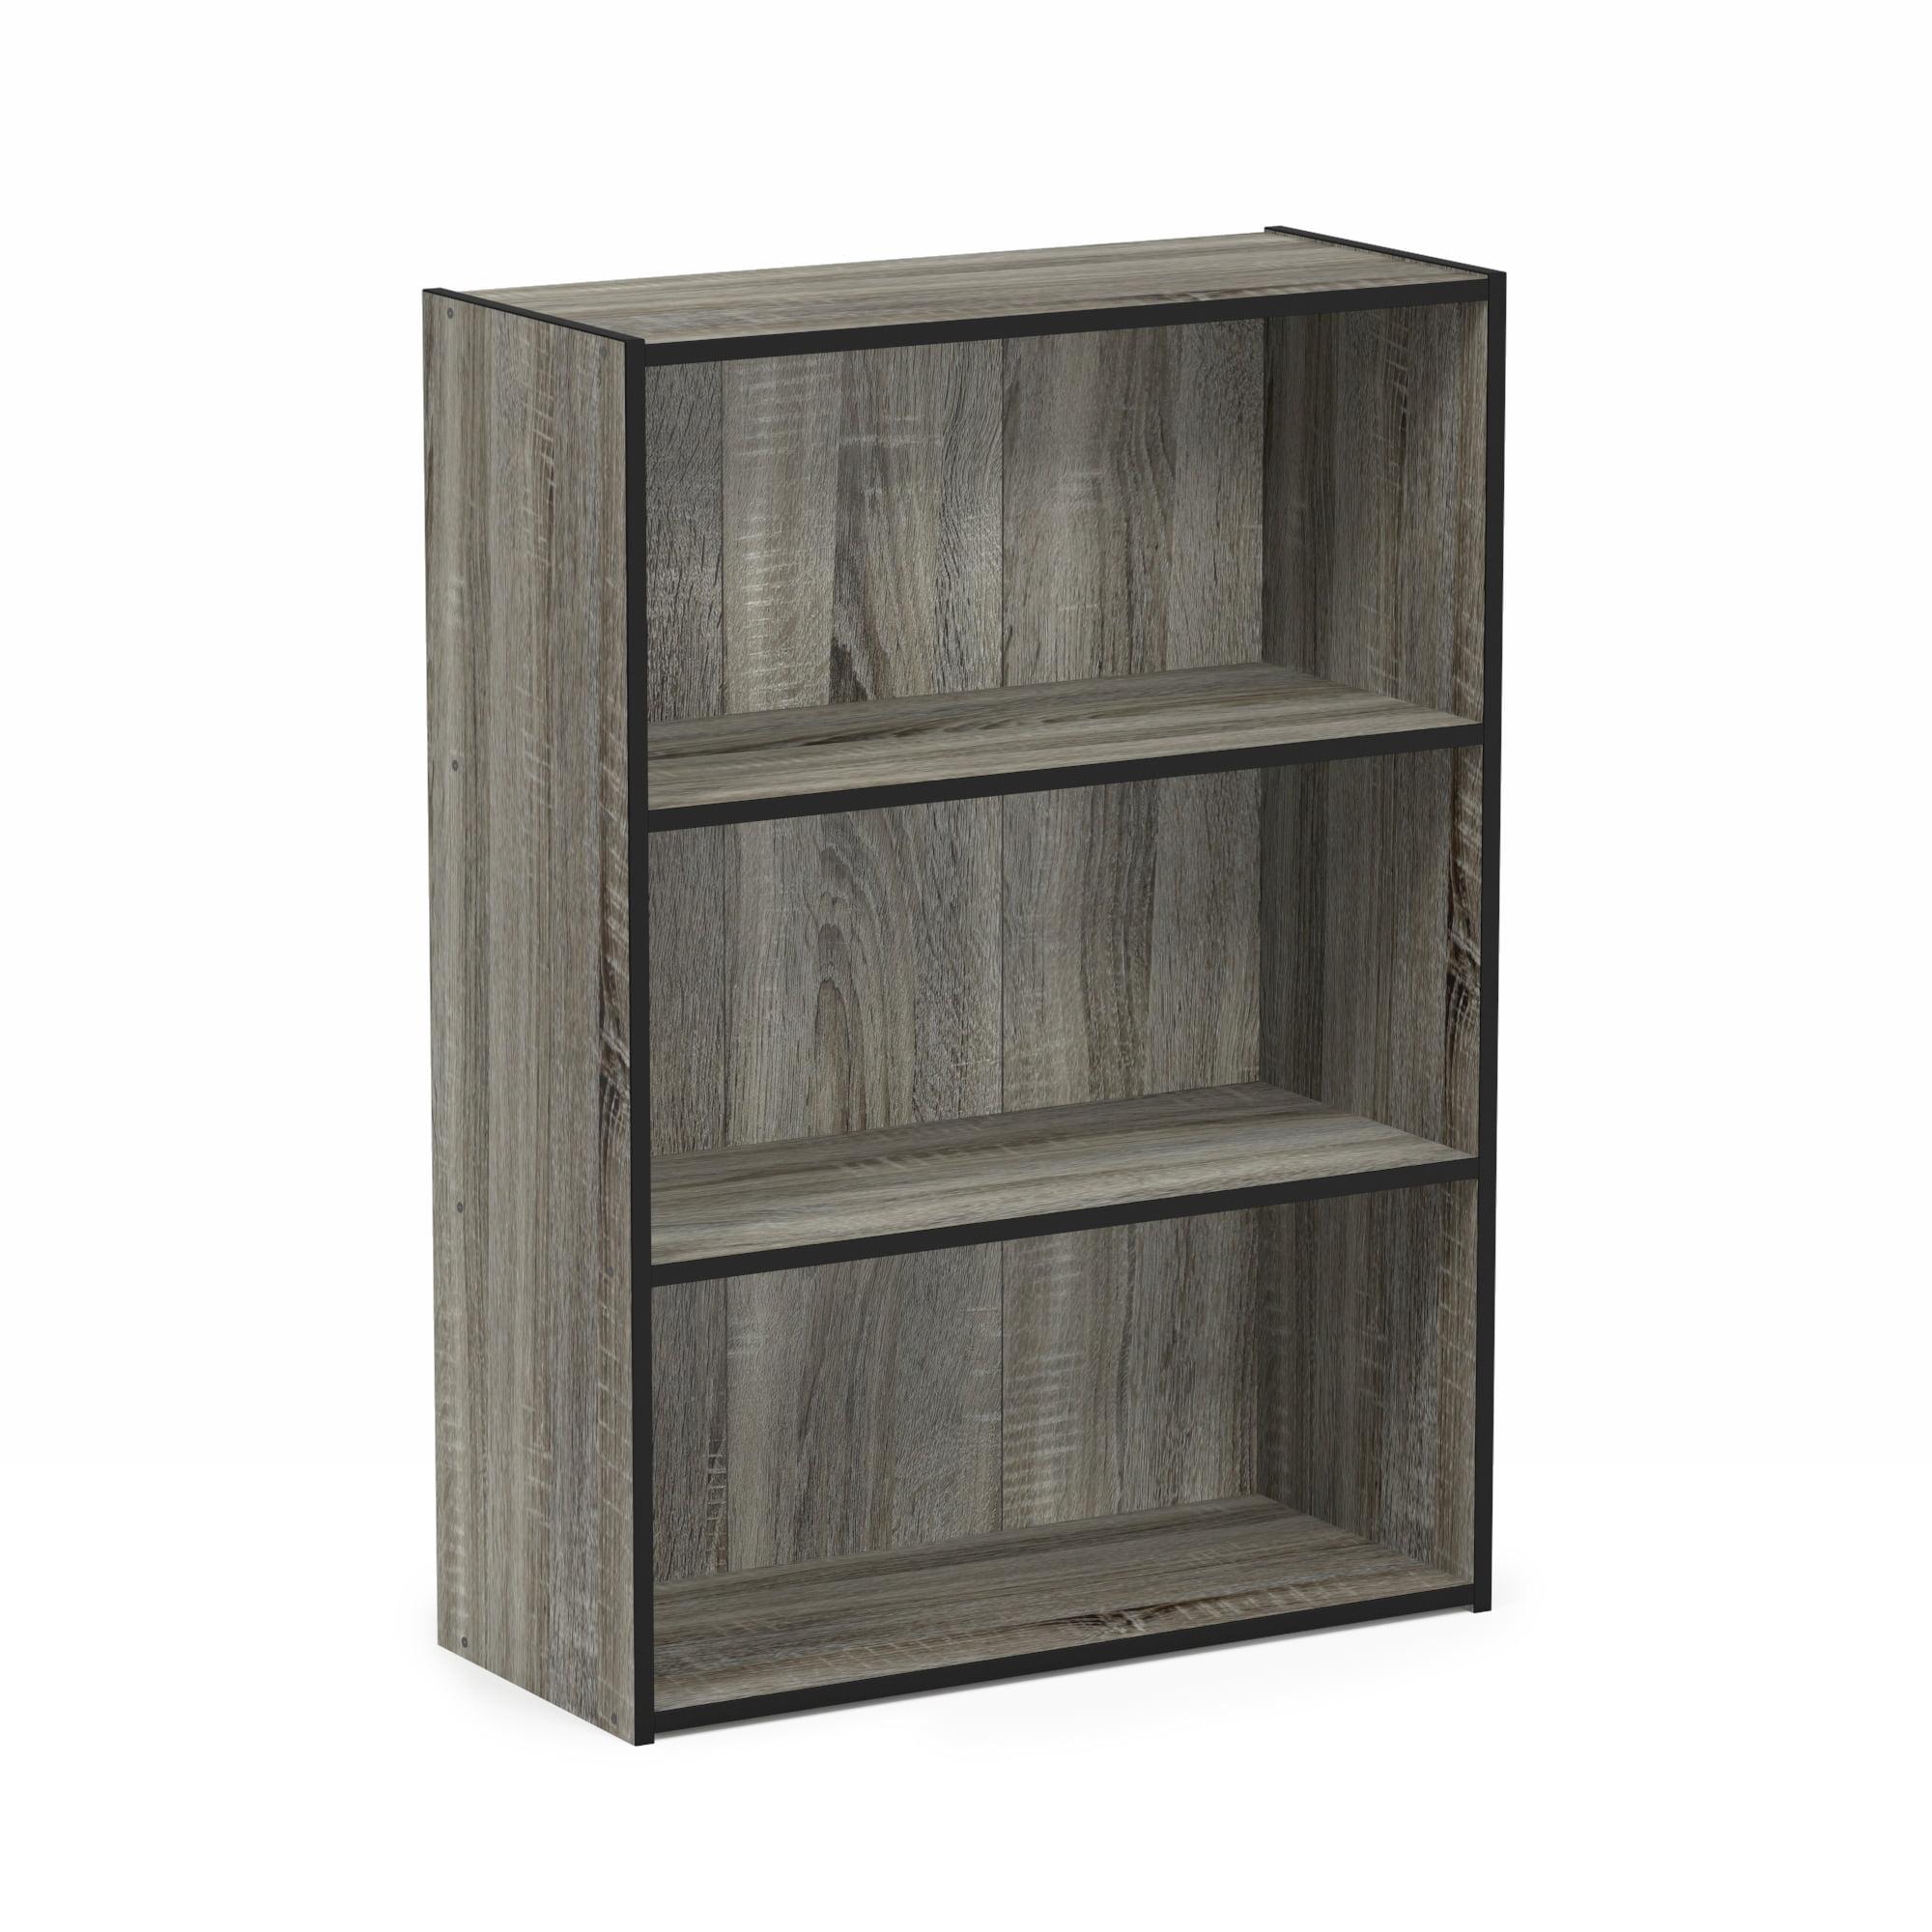 Furinno Pasir 3 Tier Open Shelf, Espresso, 11208EX